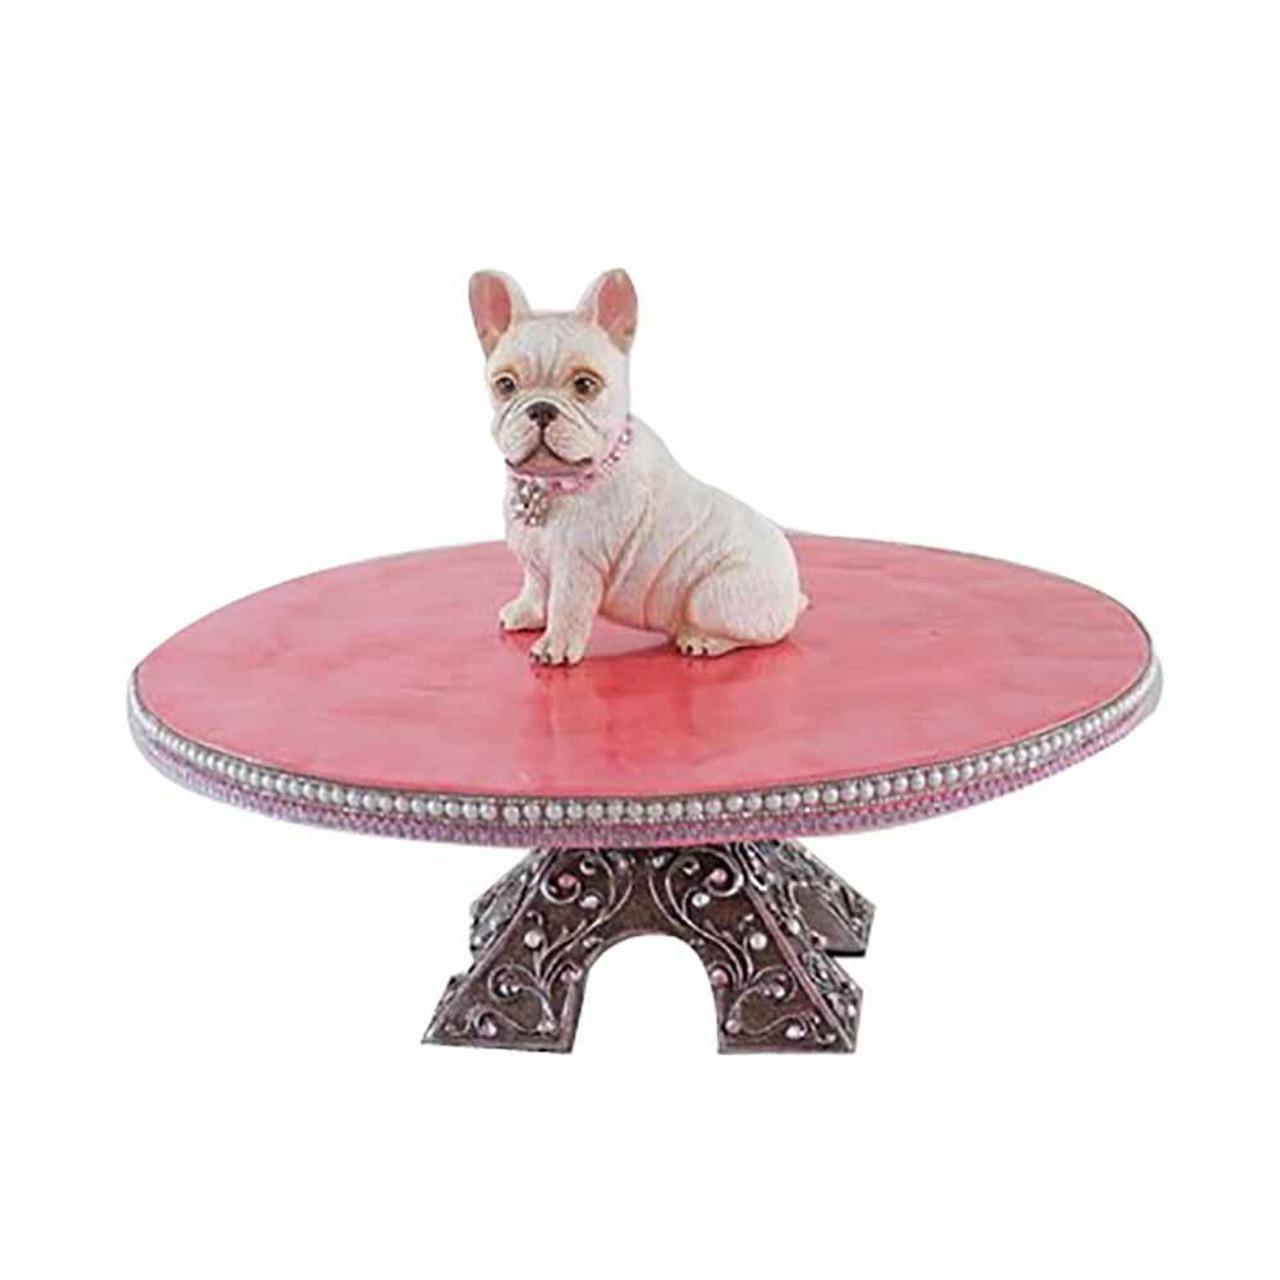 Katherines Fifi French Bulldog Tray - 30cm